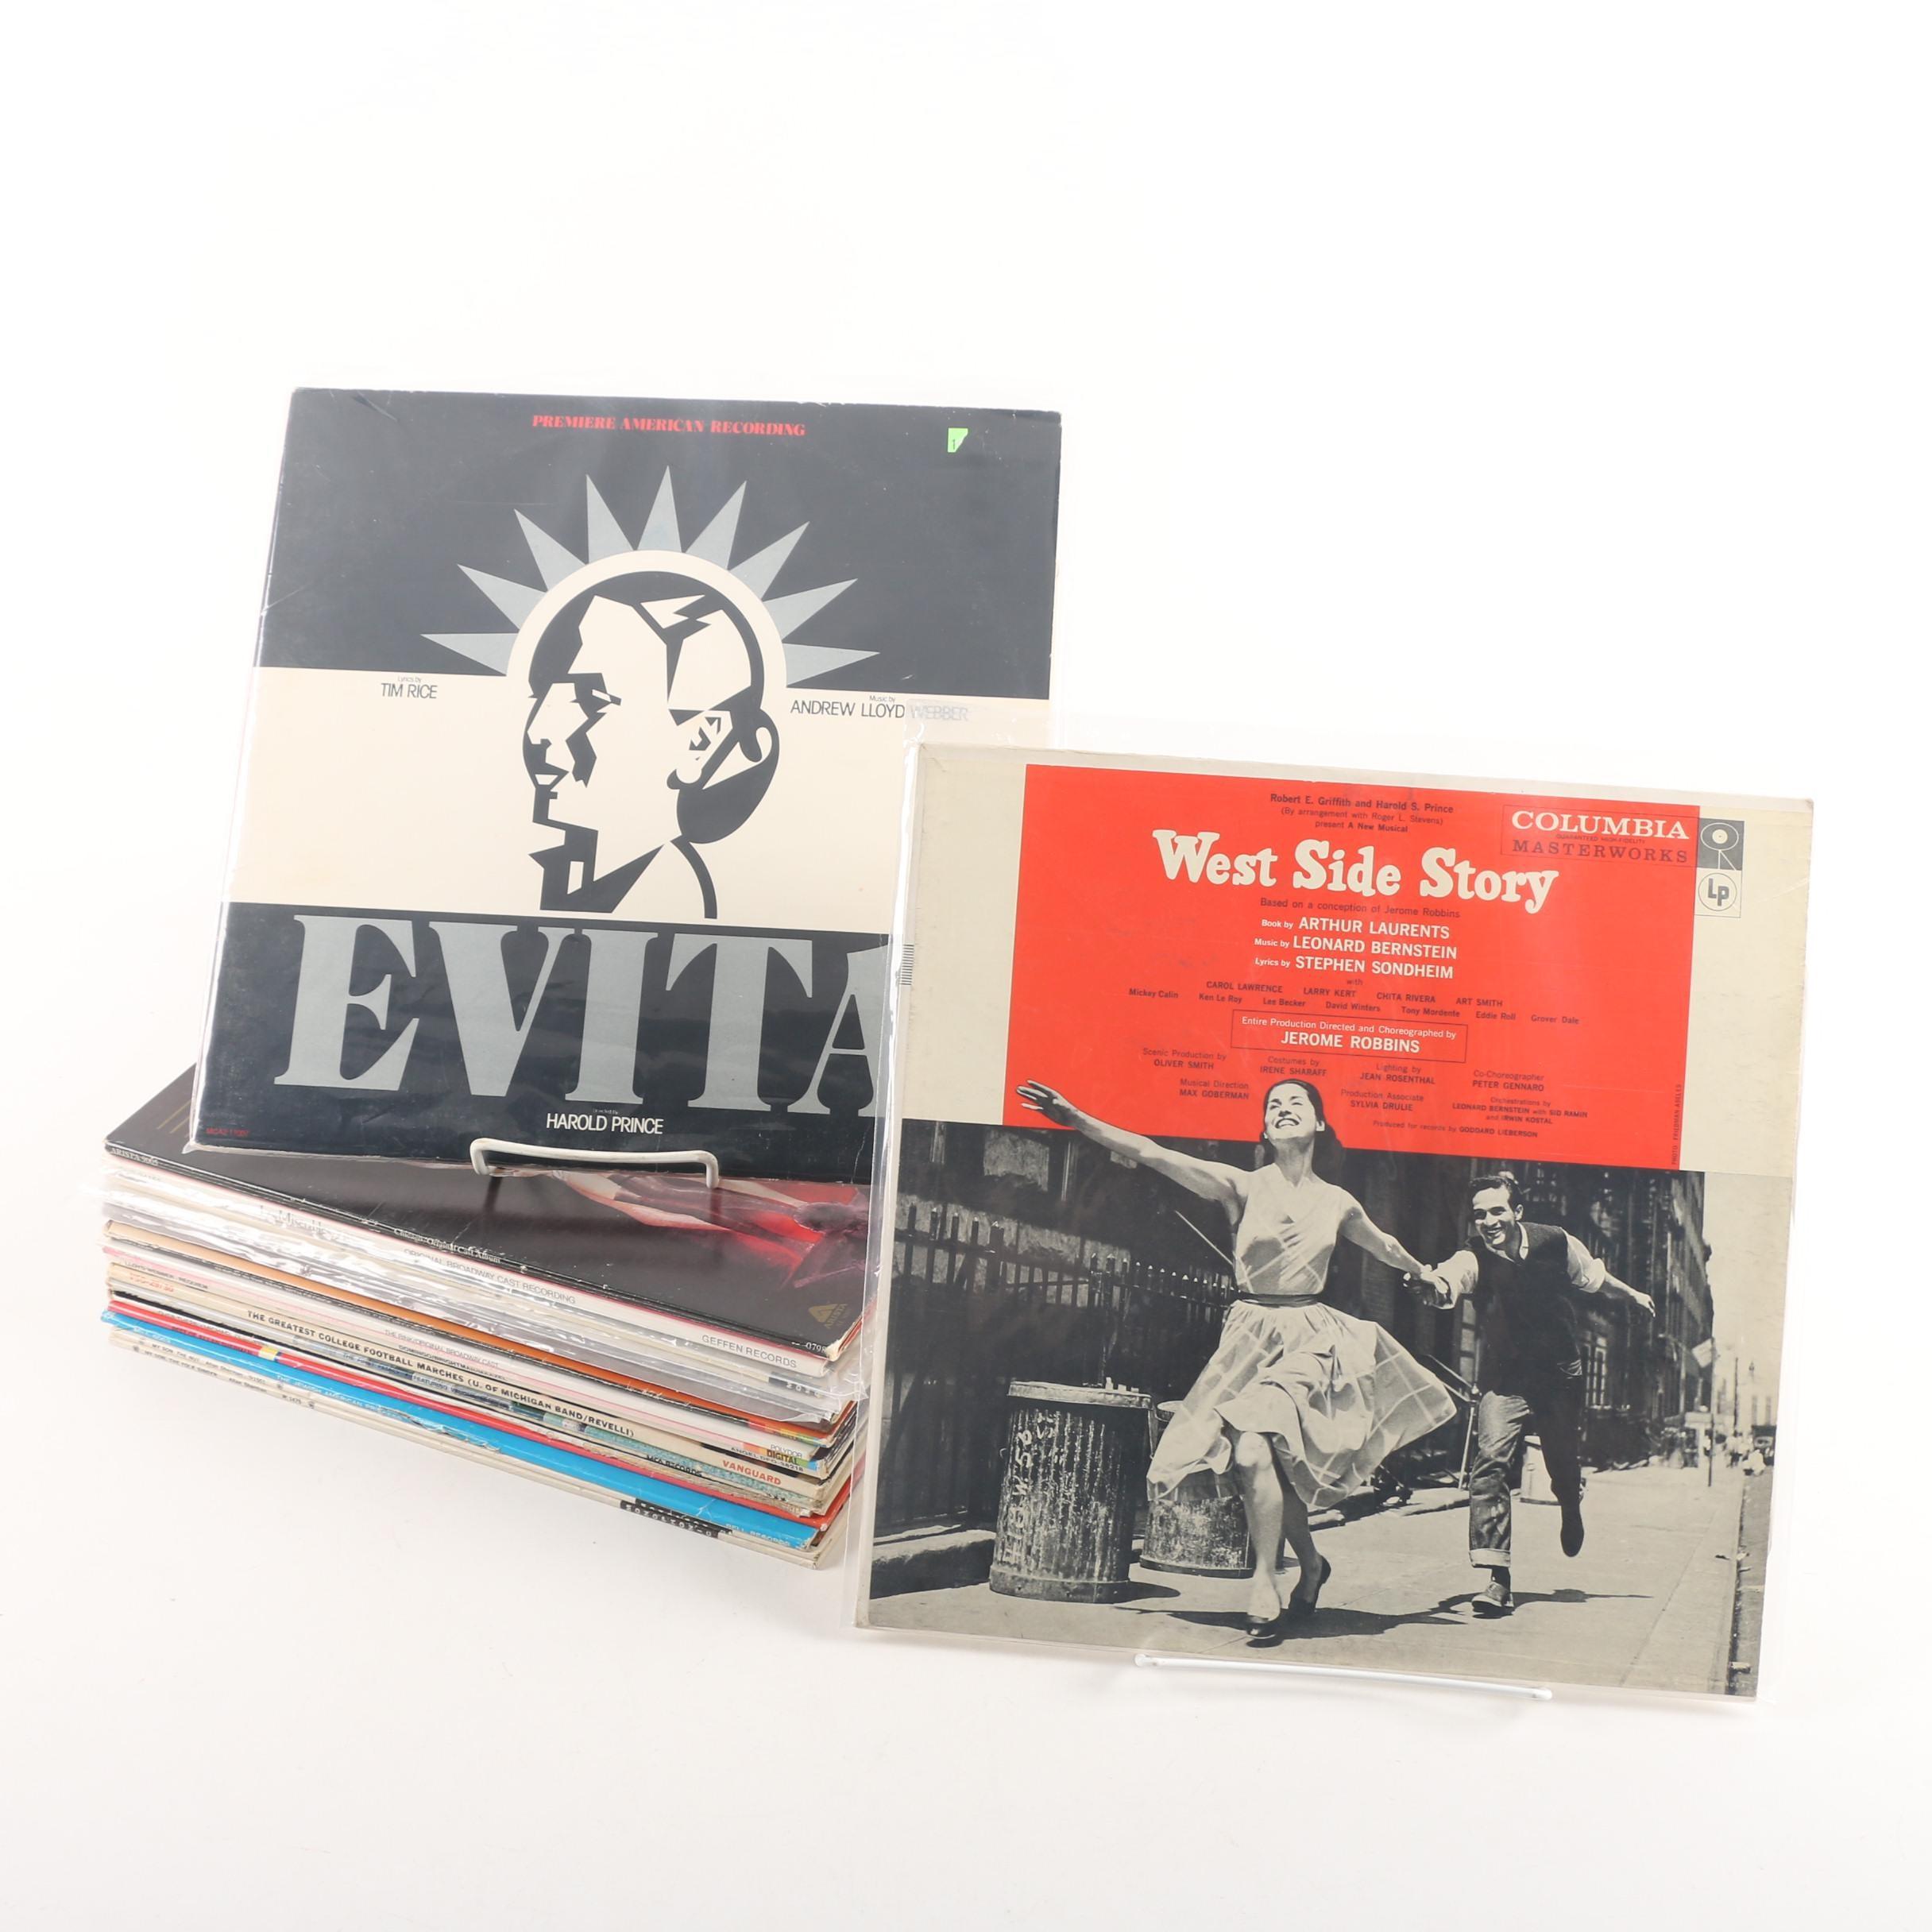 Vintage Soundtrack, Novelty and Pop Records Including Jimmy Durante